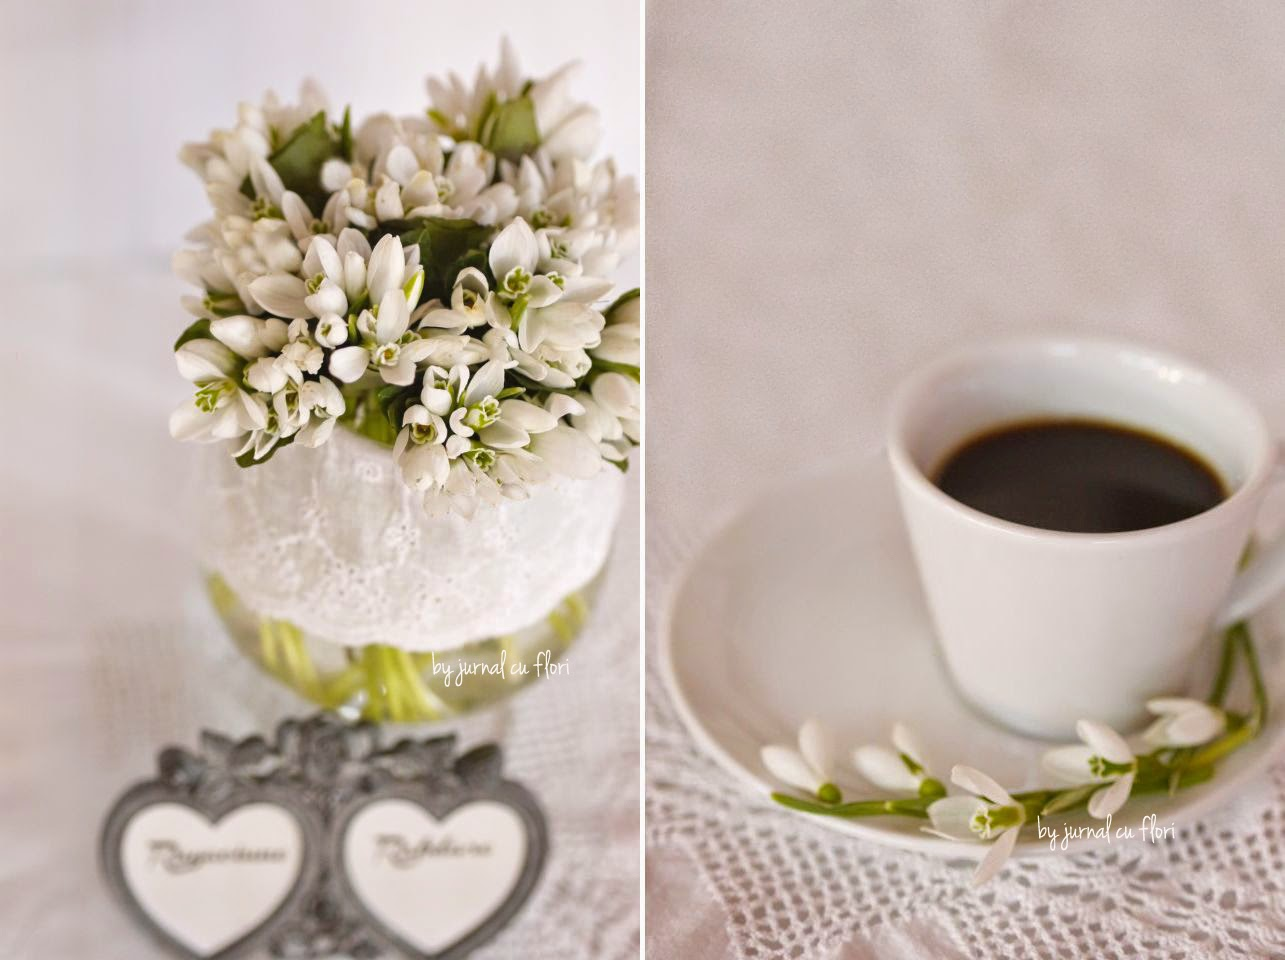 poza foto buchet de ghiocei in pahar cu dantela si rama cu inimi si cafea cu flori pe farfurie